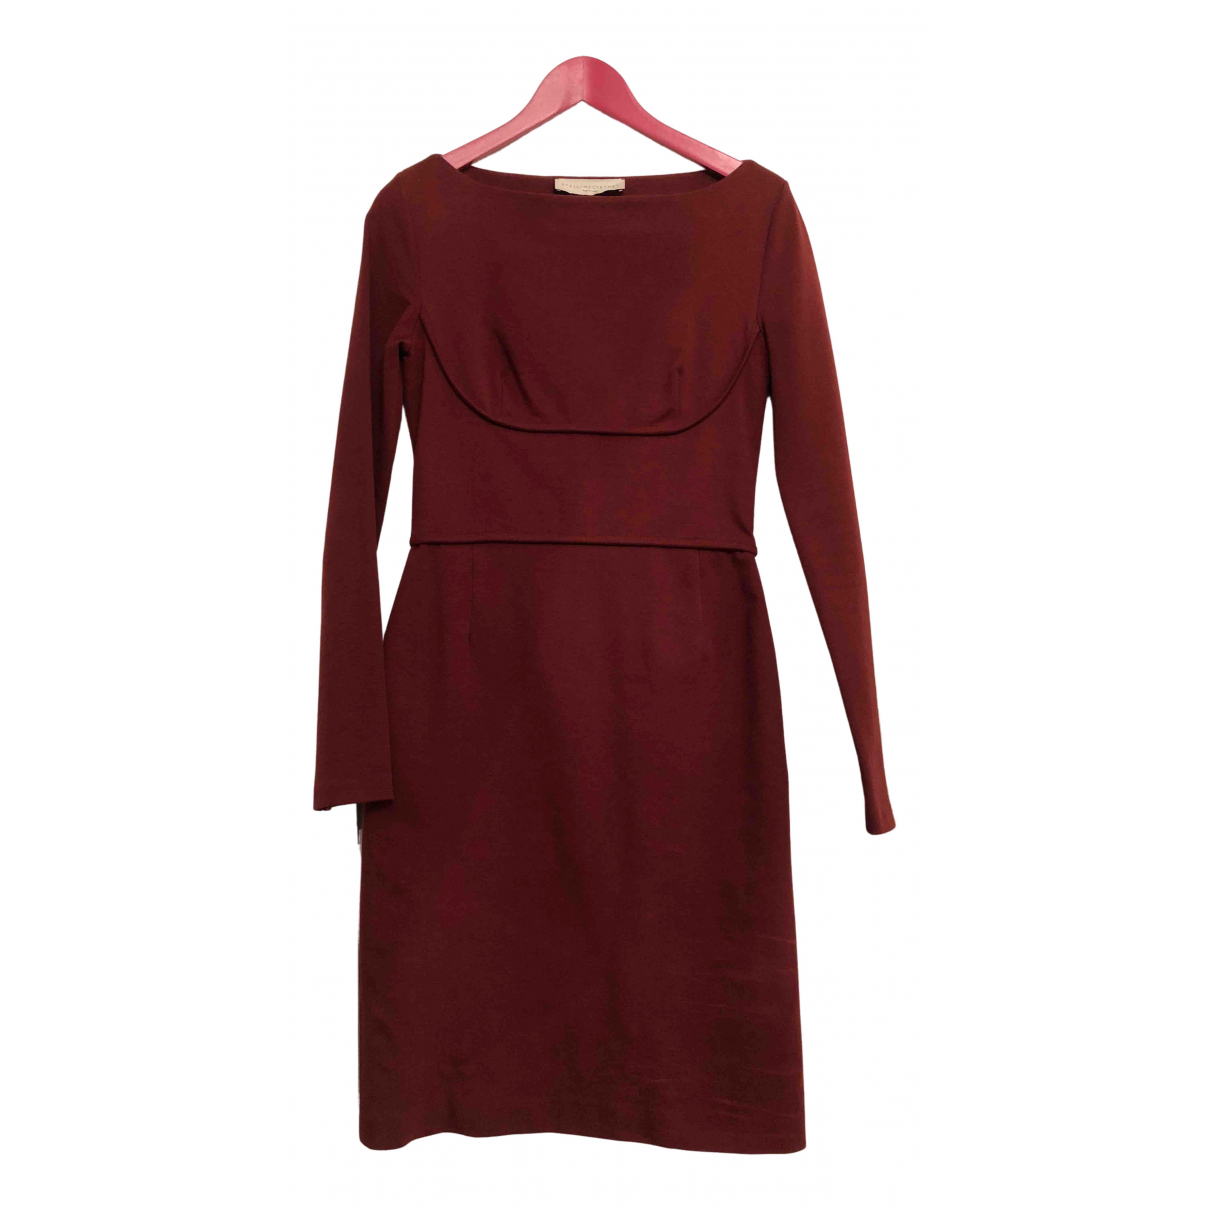 Stella Mccartney N Burgundy Cotton - elasthane dress for Women 44 IT